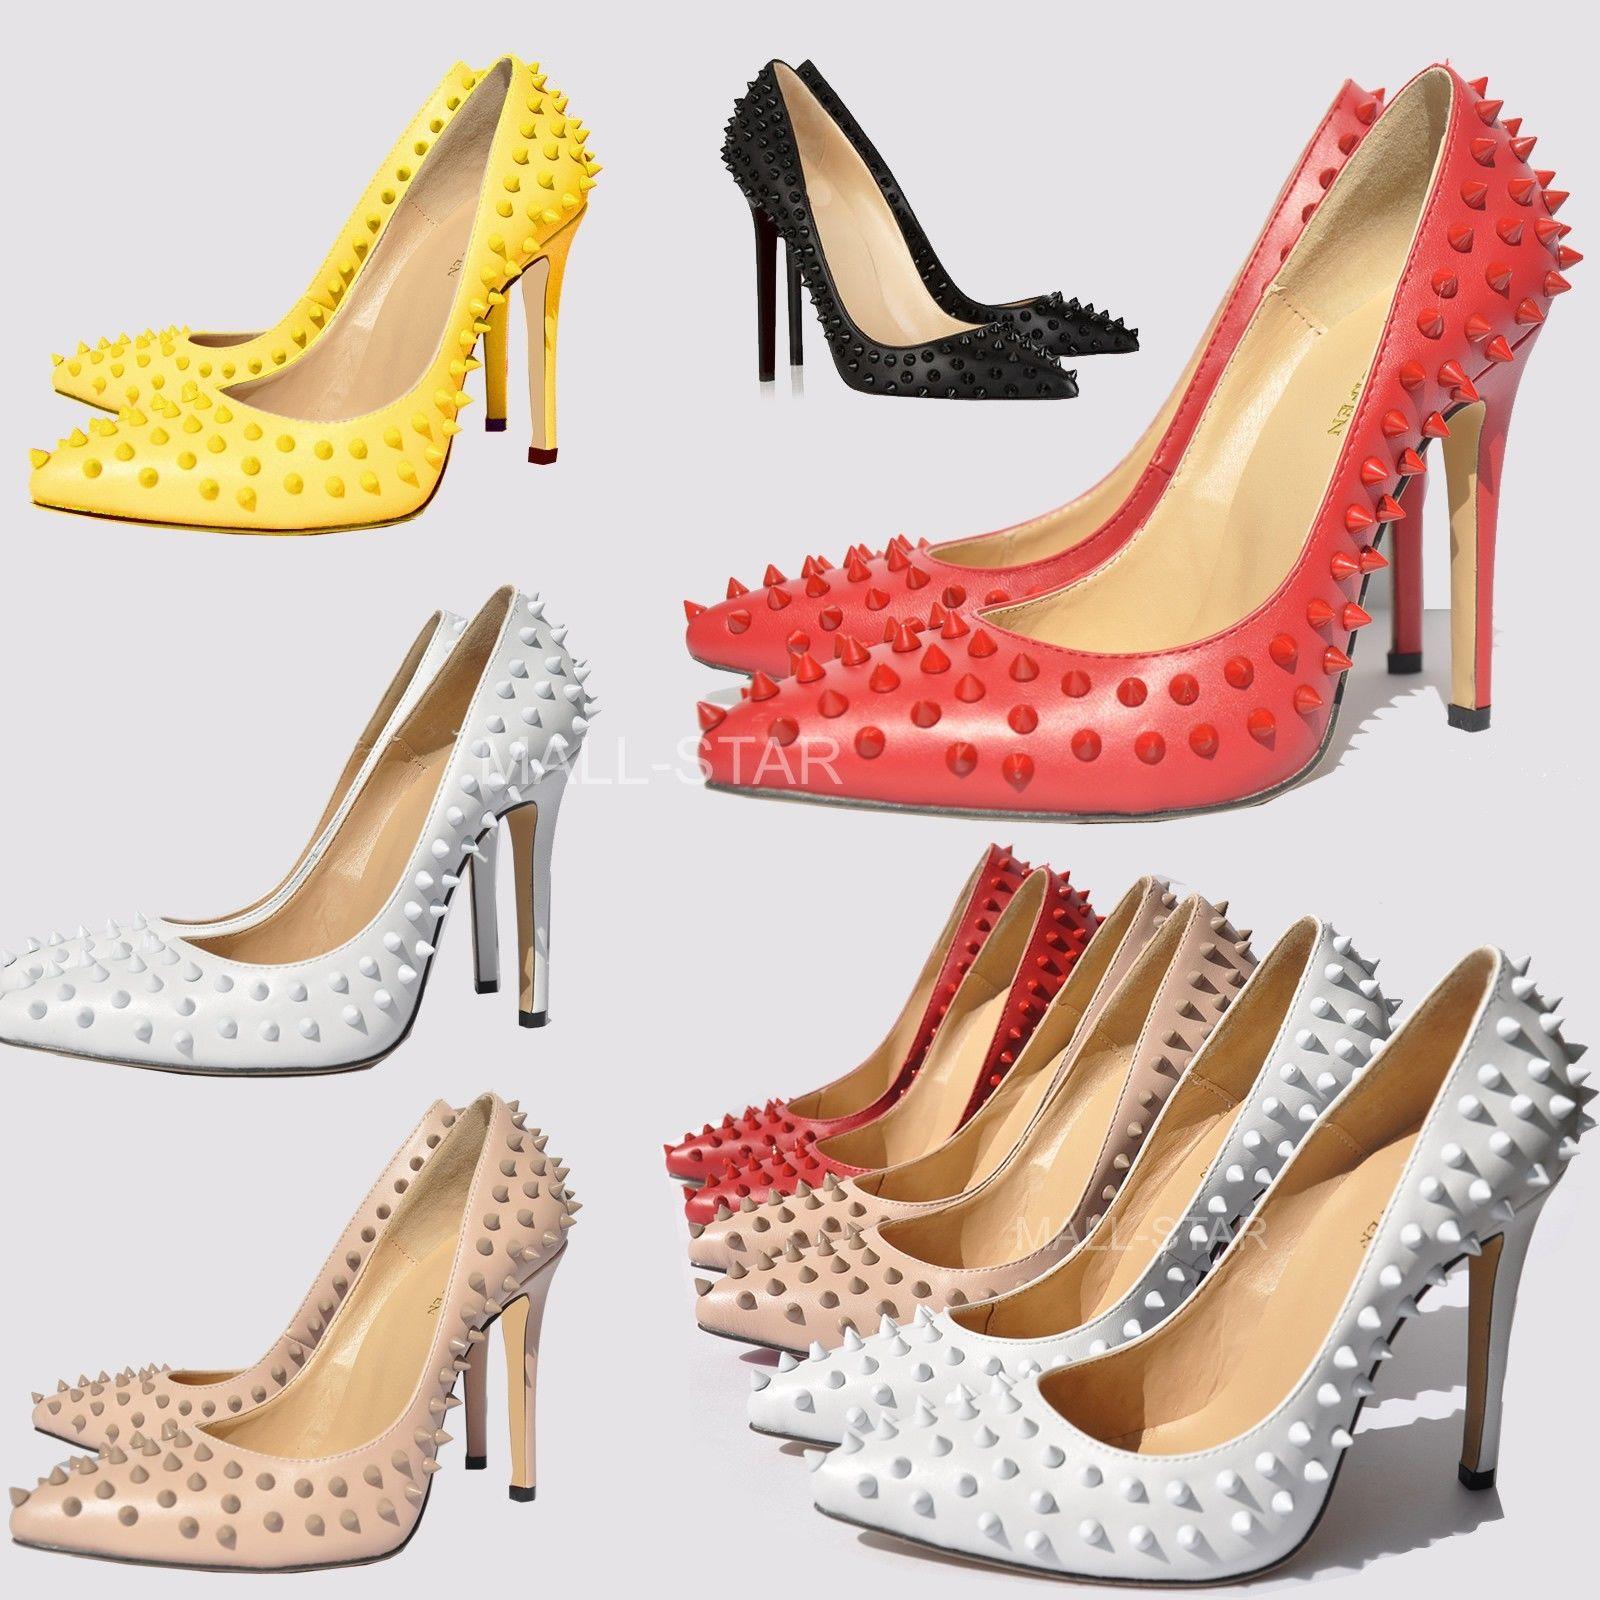 High Heel Pointed Corset Style Work Pumps Court Shoes Rivets Studs Matt US T302 | eBay